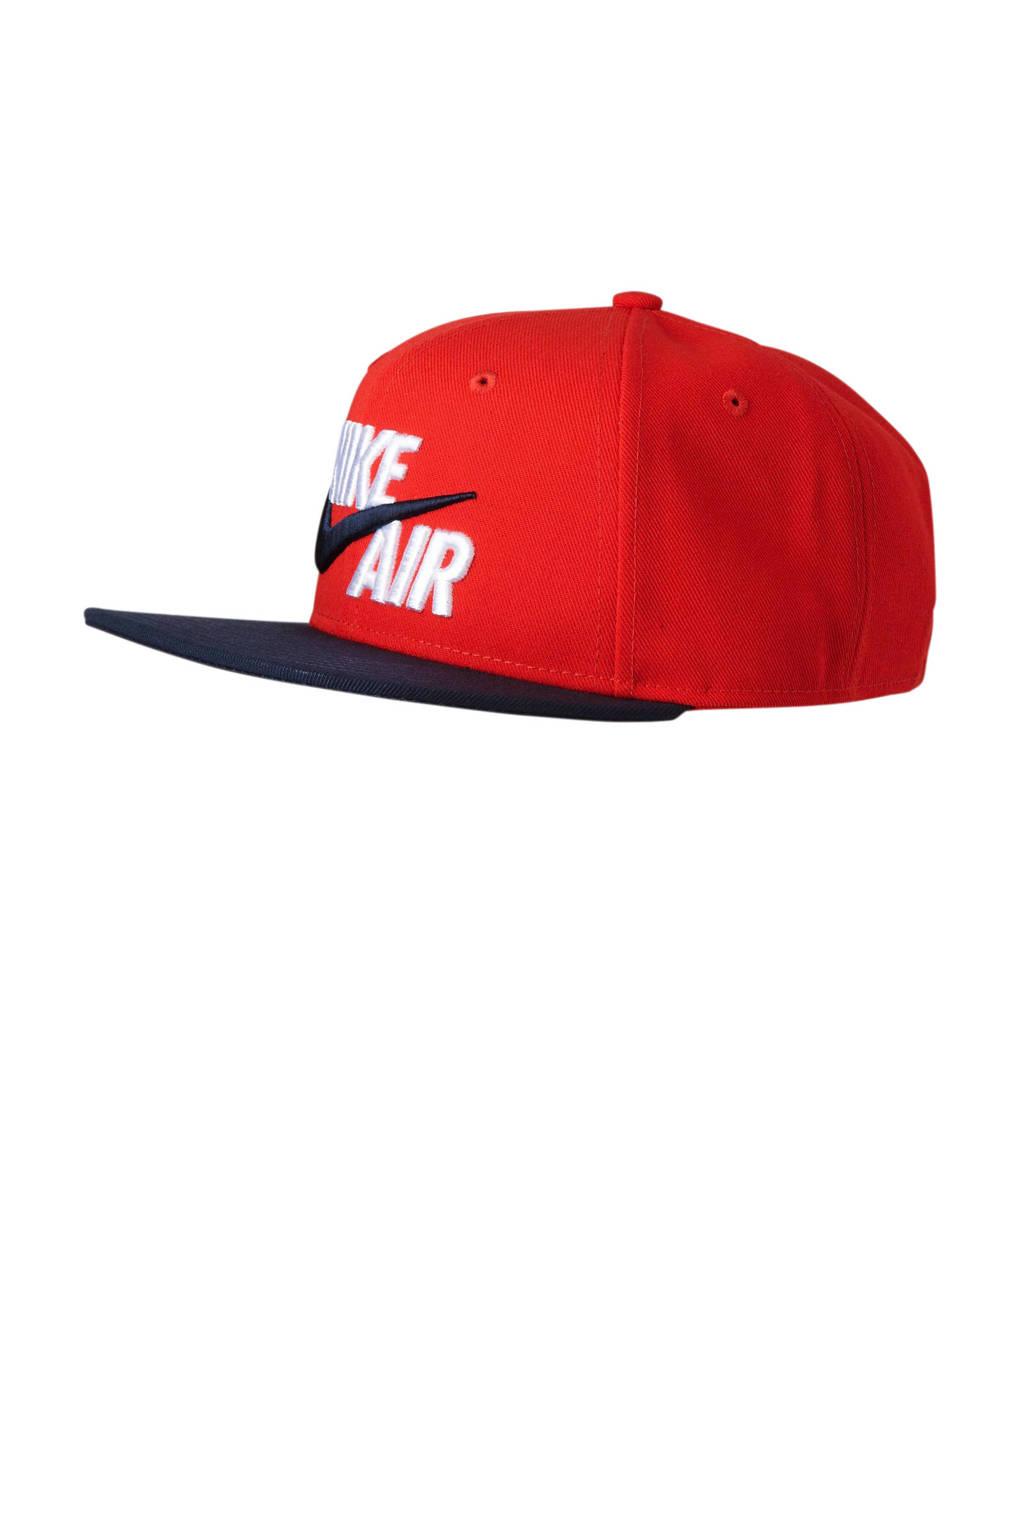 Nike pet rood/blauw, Rood/blauw